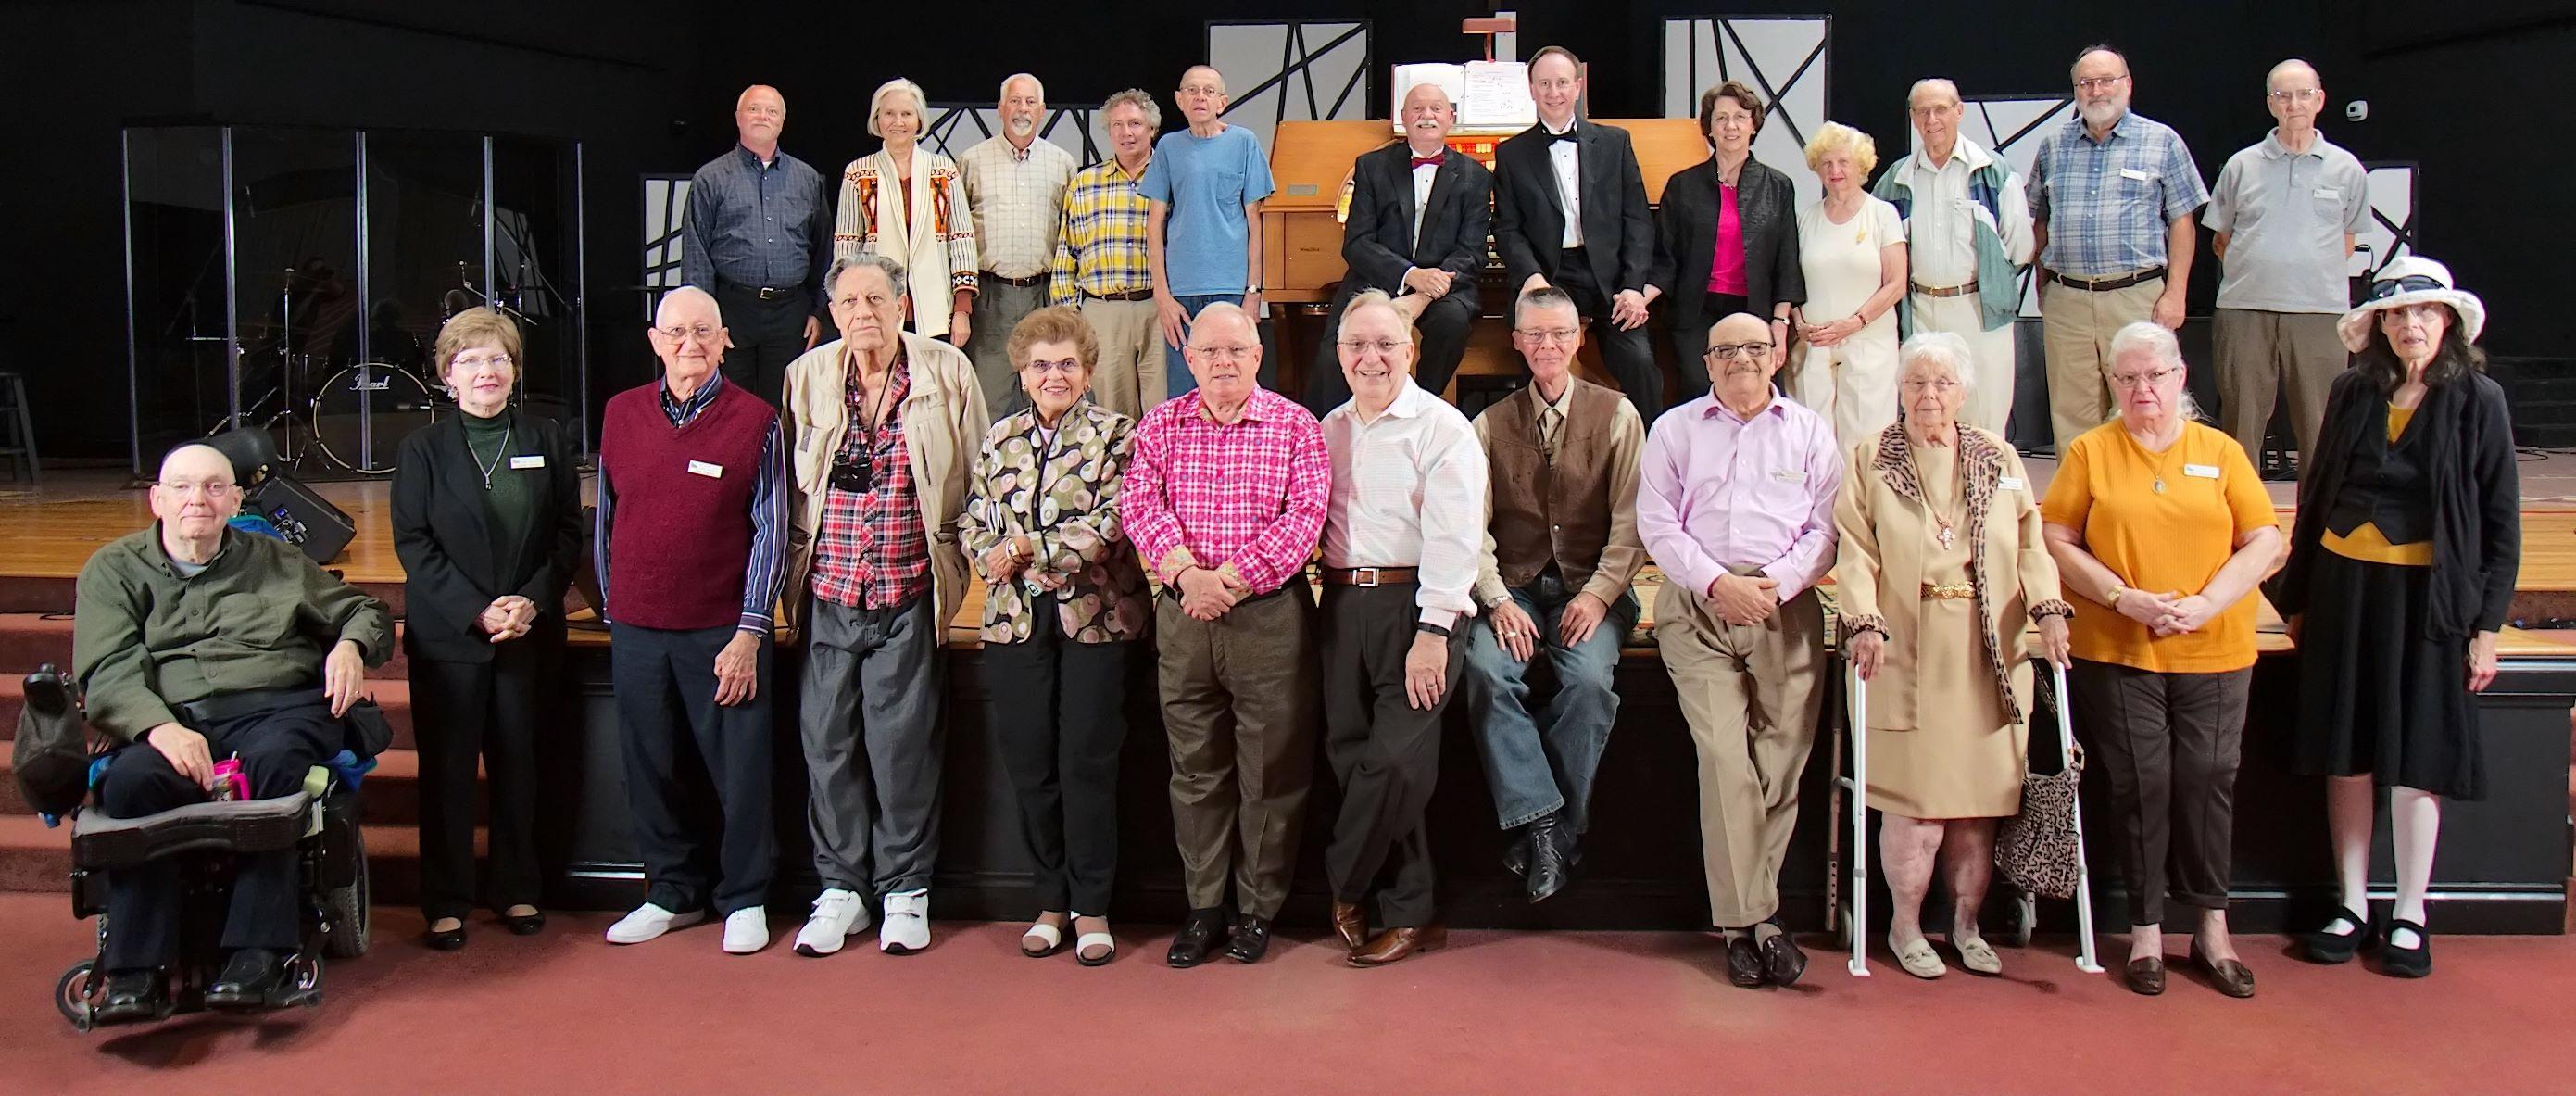 25th MTOS Anniversary group shot